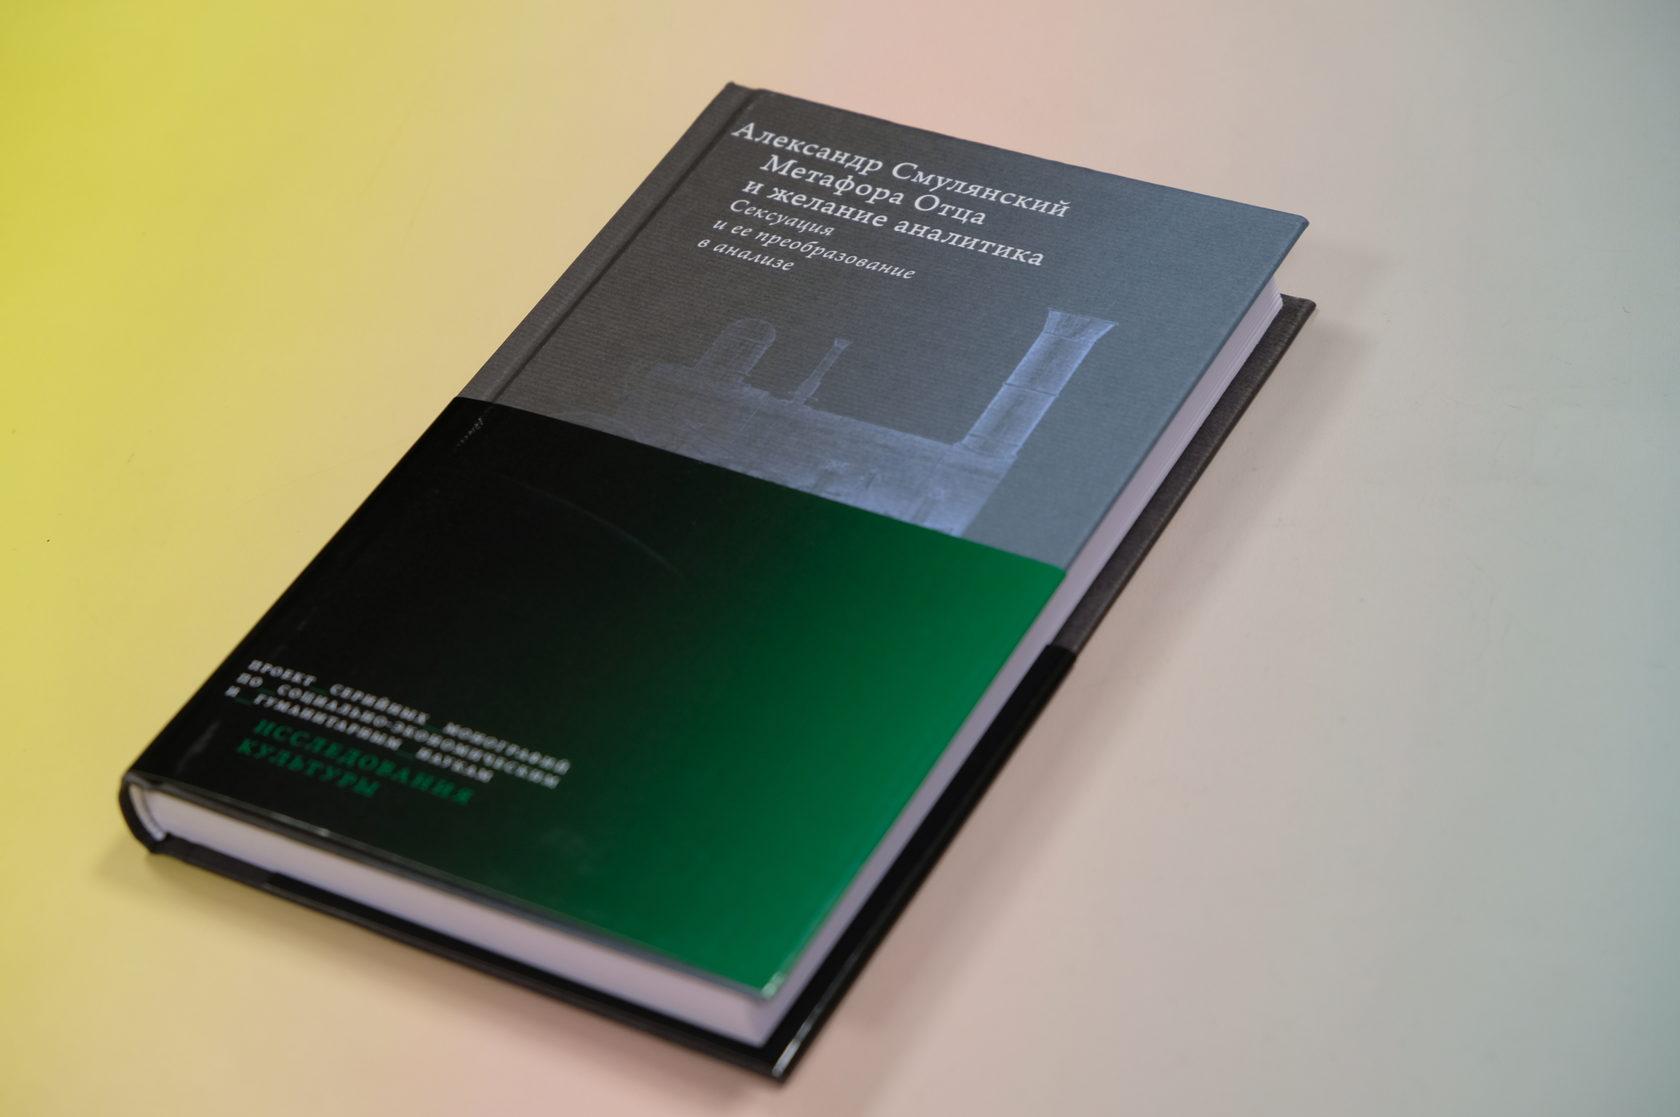 Купить книгу Александр Смулянский «Метафора Отца и желание аналитика. Сексуация и ее преобразование в анализе»